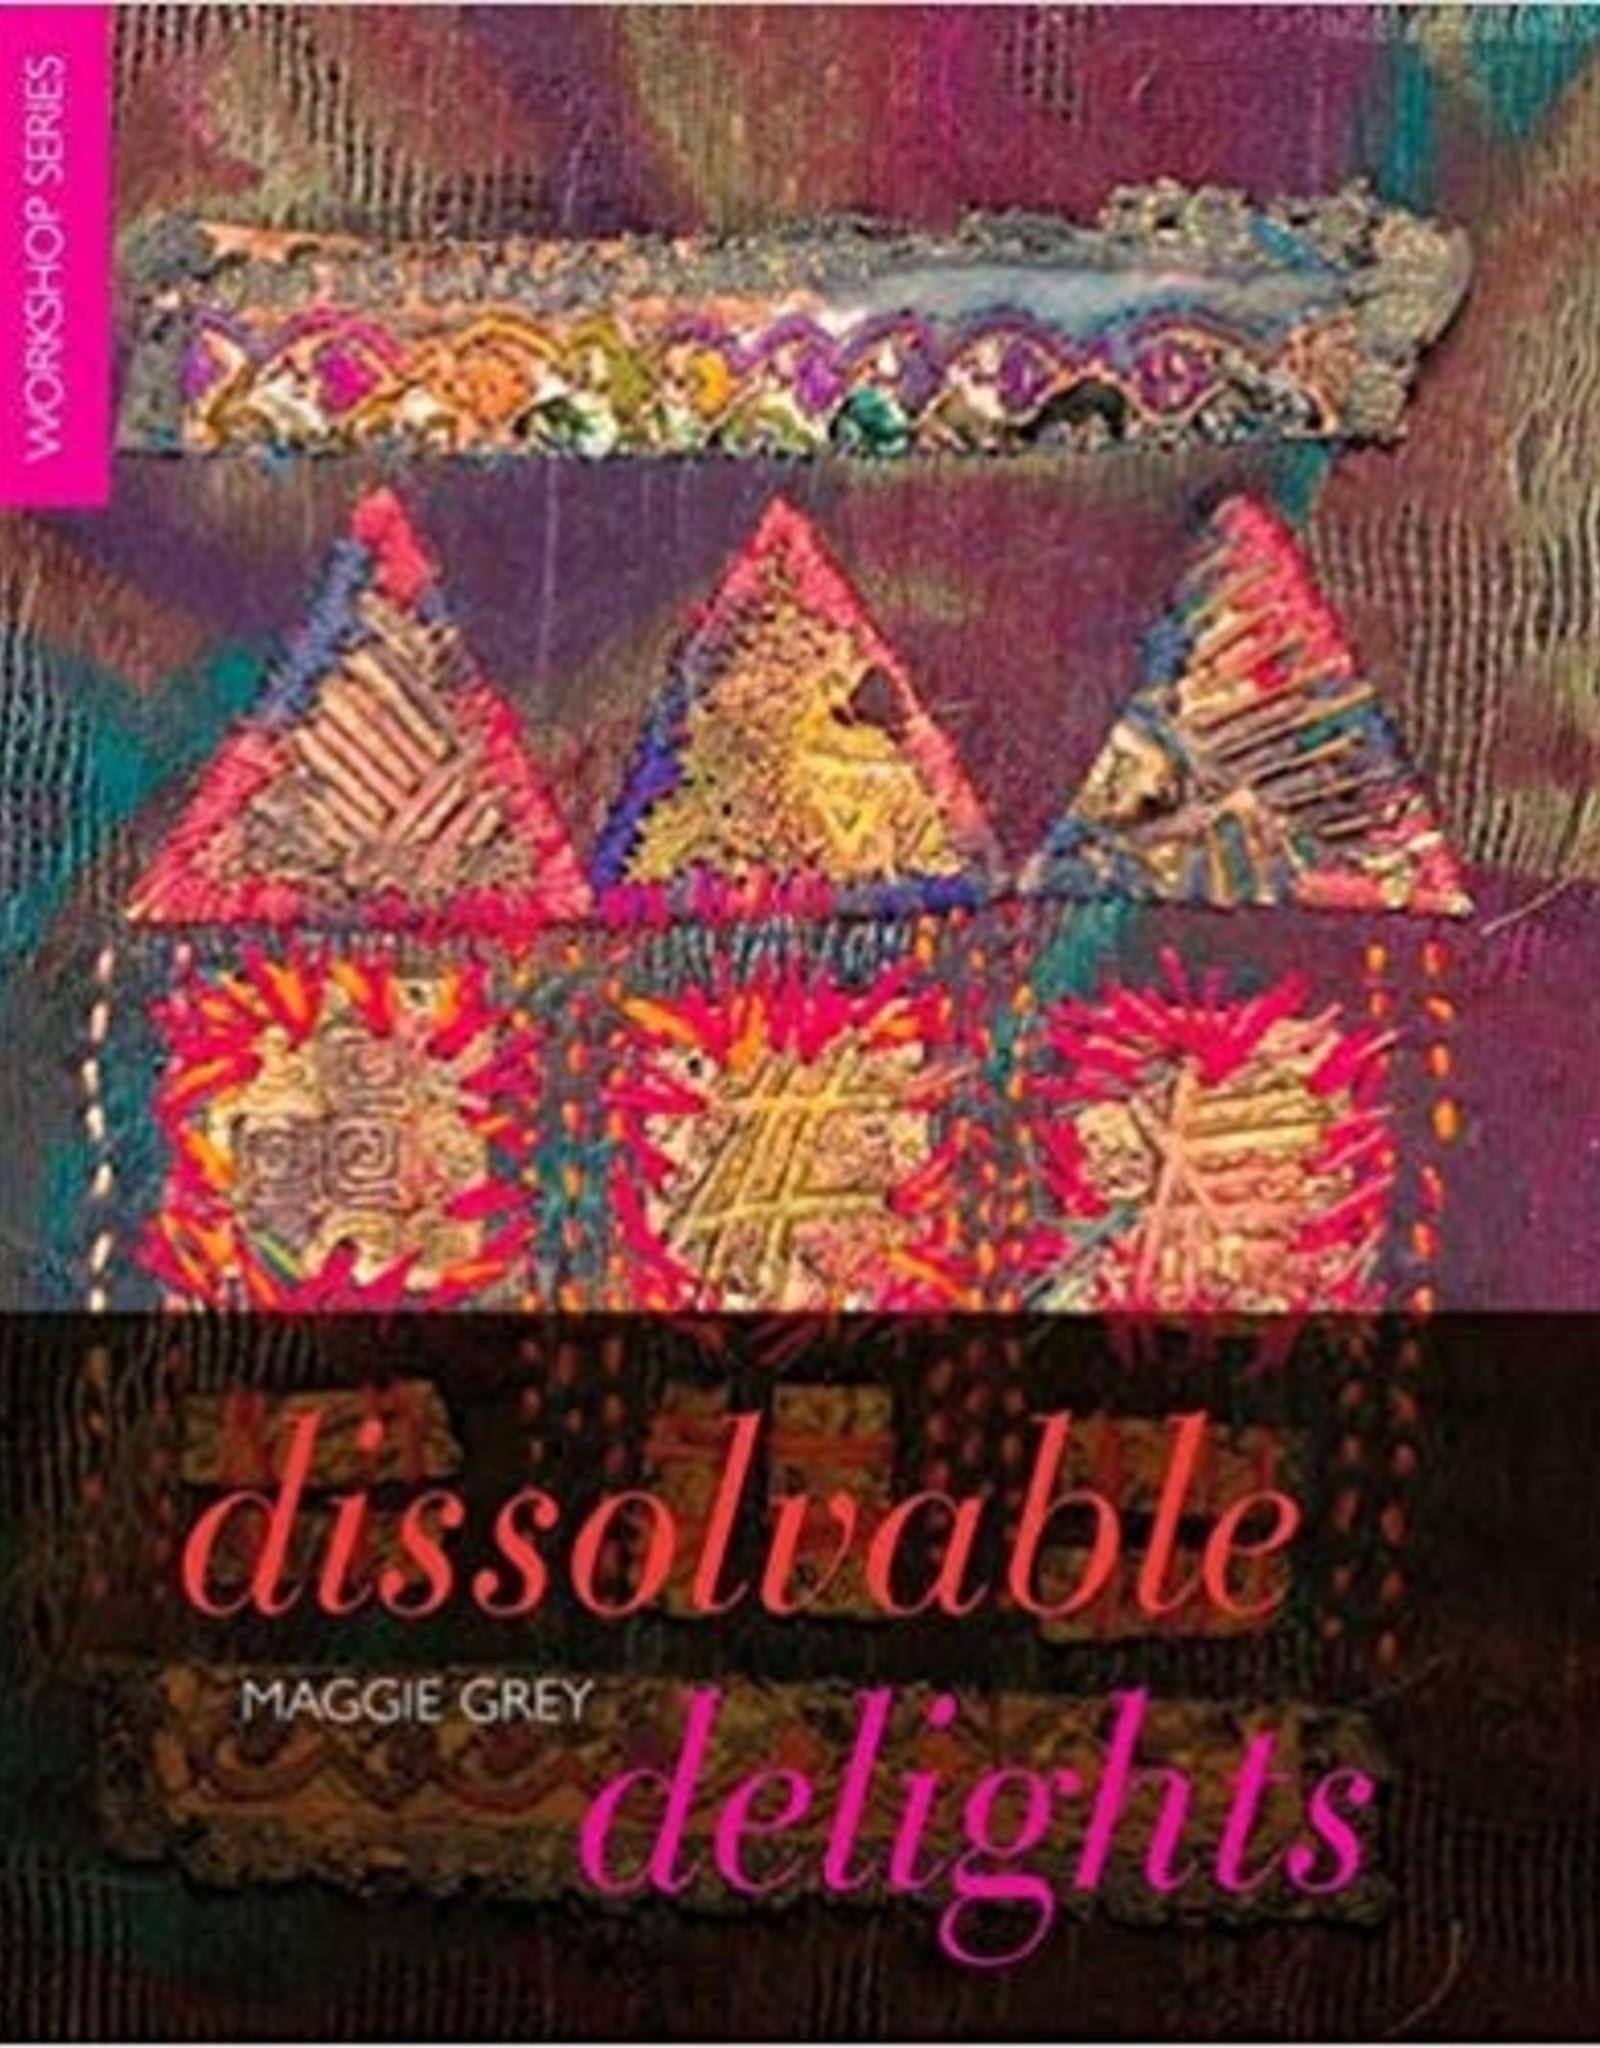 Dissolvable Delights / Maggie Grey